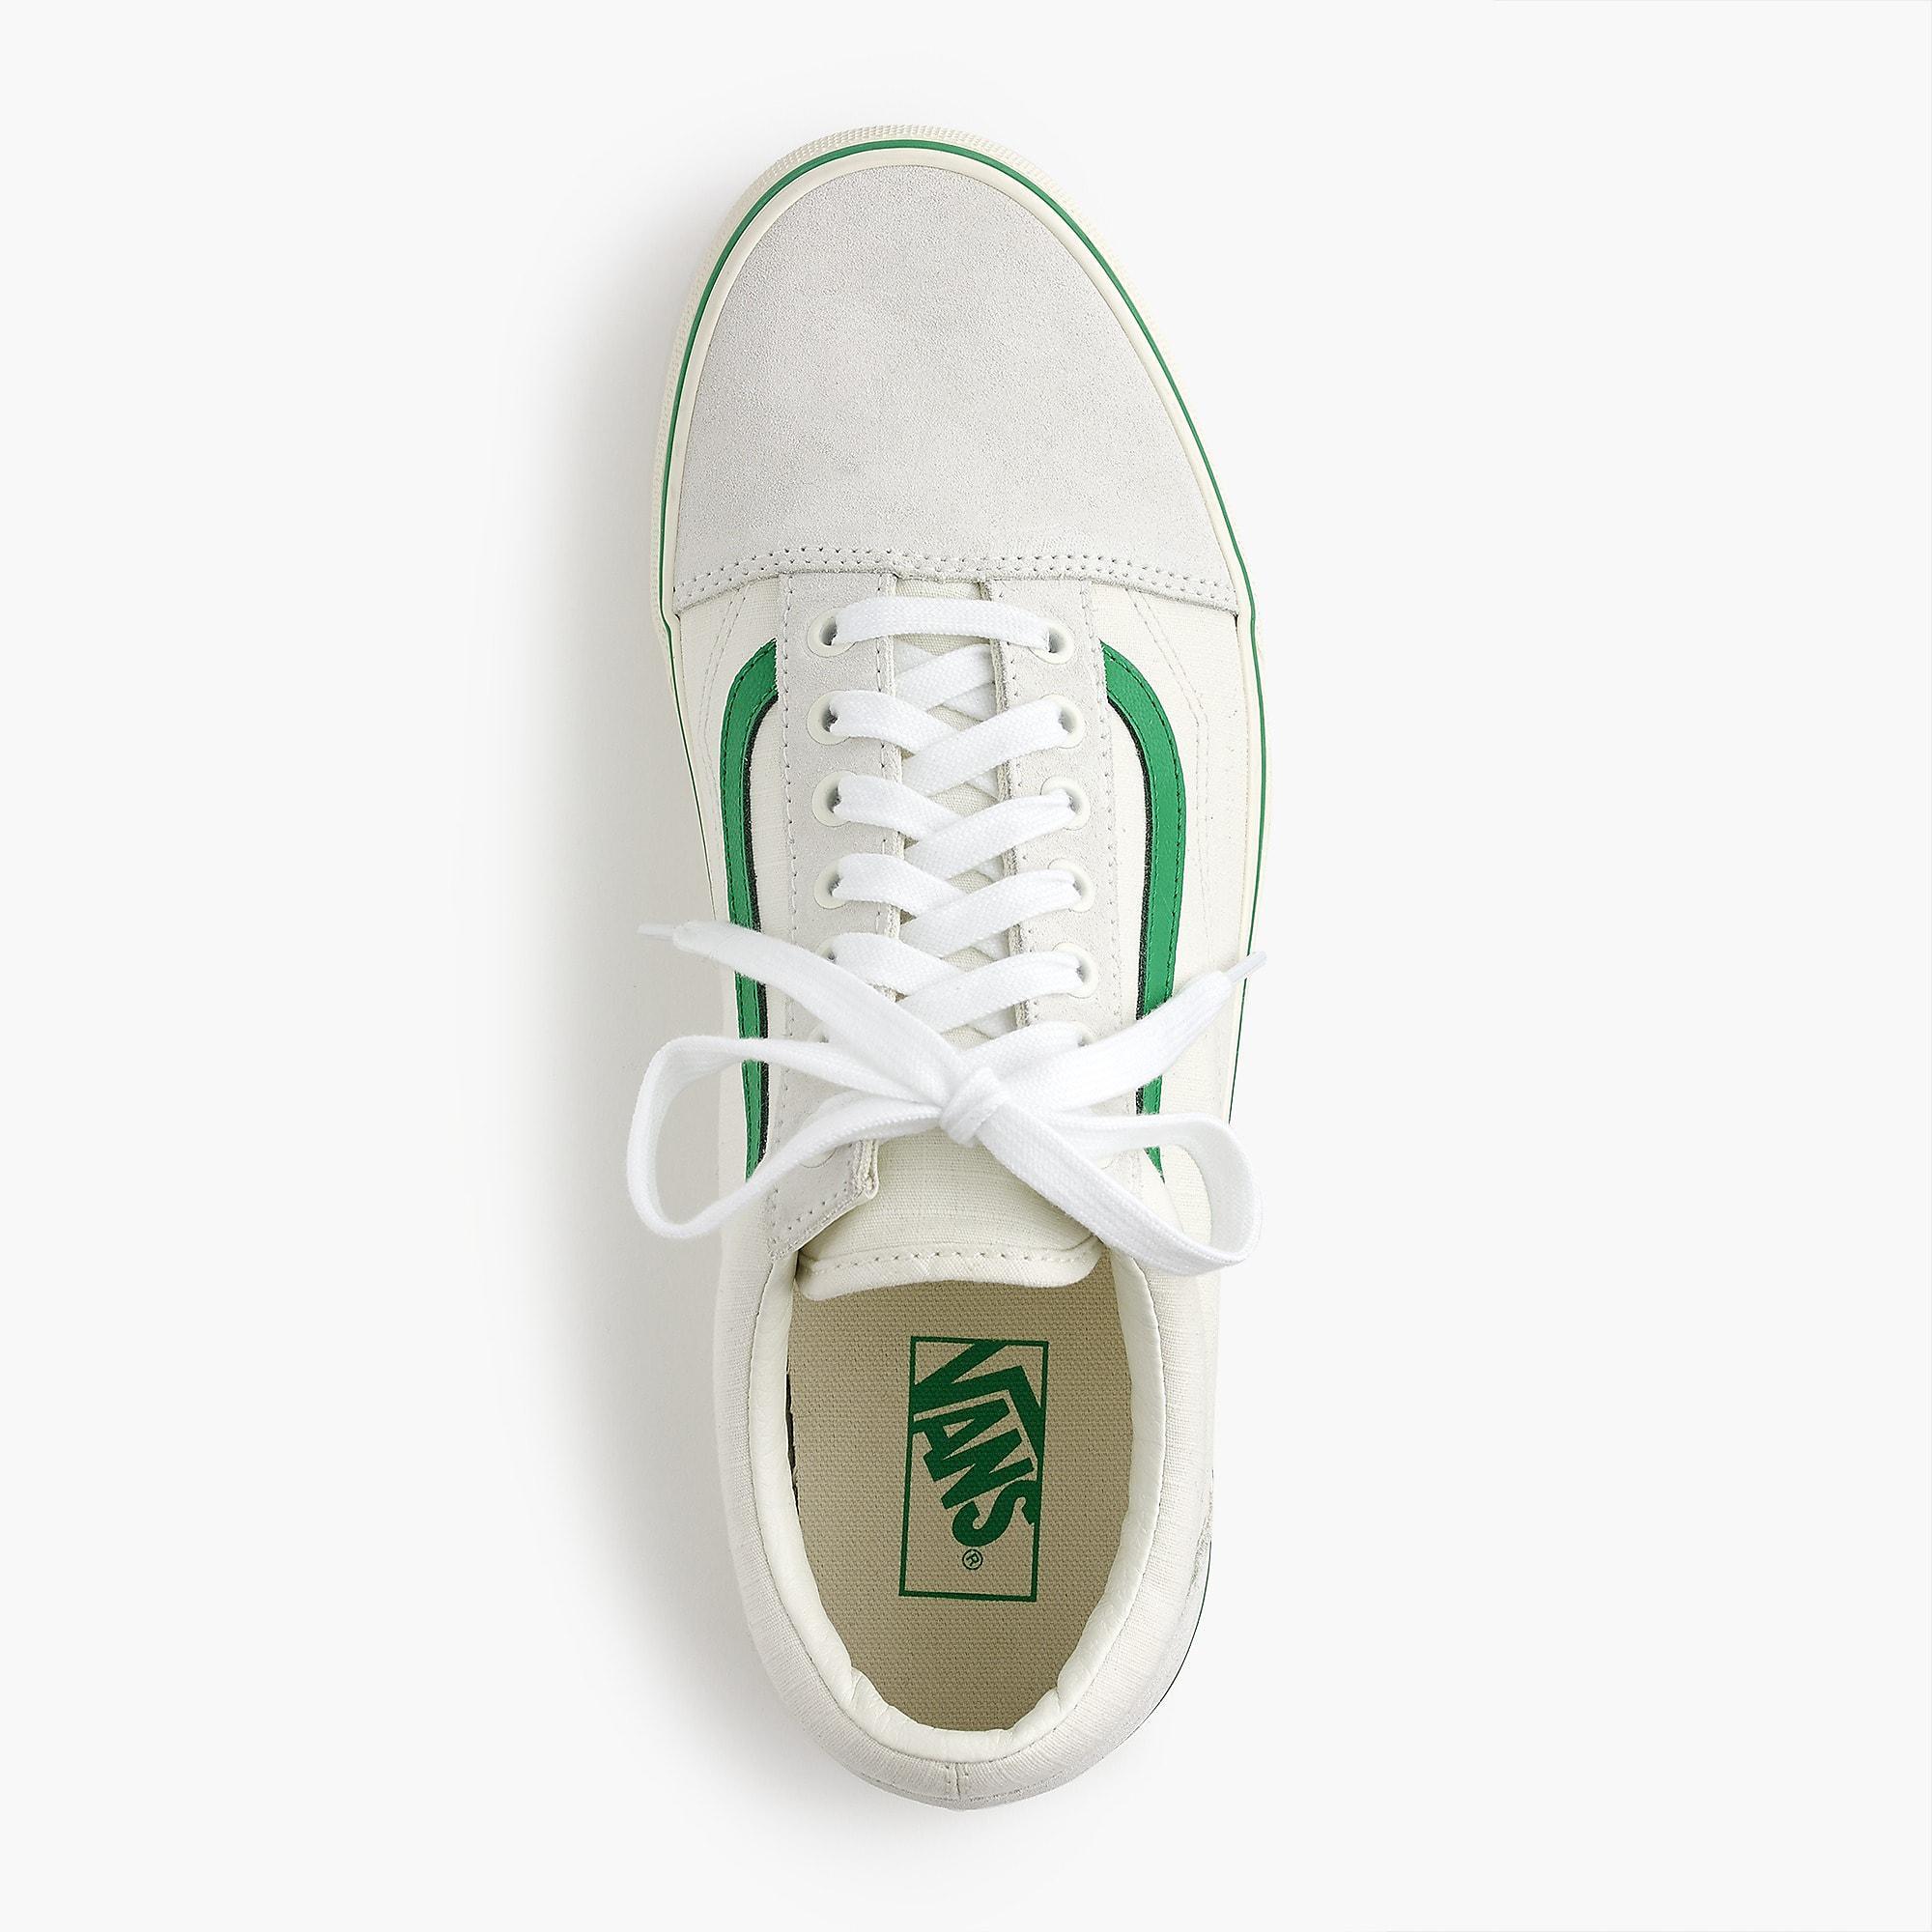 cea254801a Lyst - Vans Old Skool Sneakers In Ripstop Cotton in Green for Men